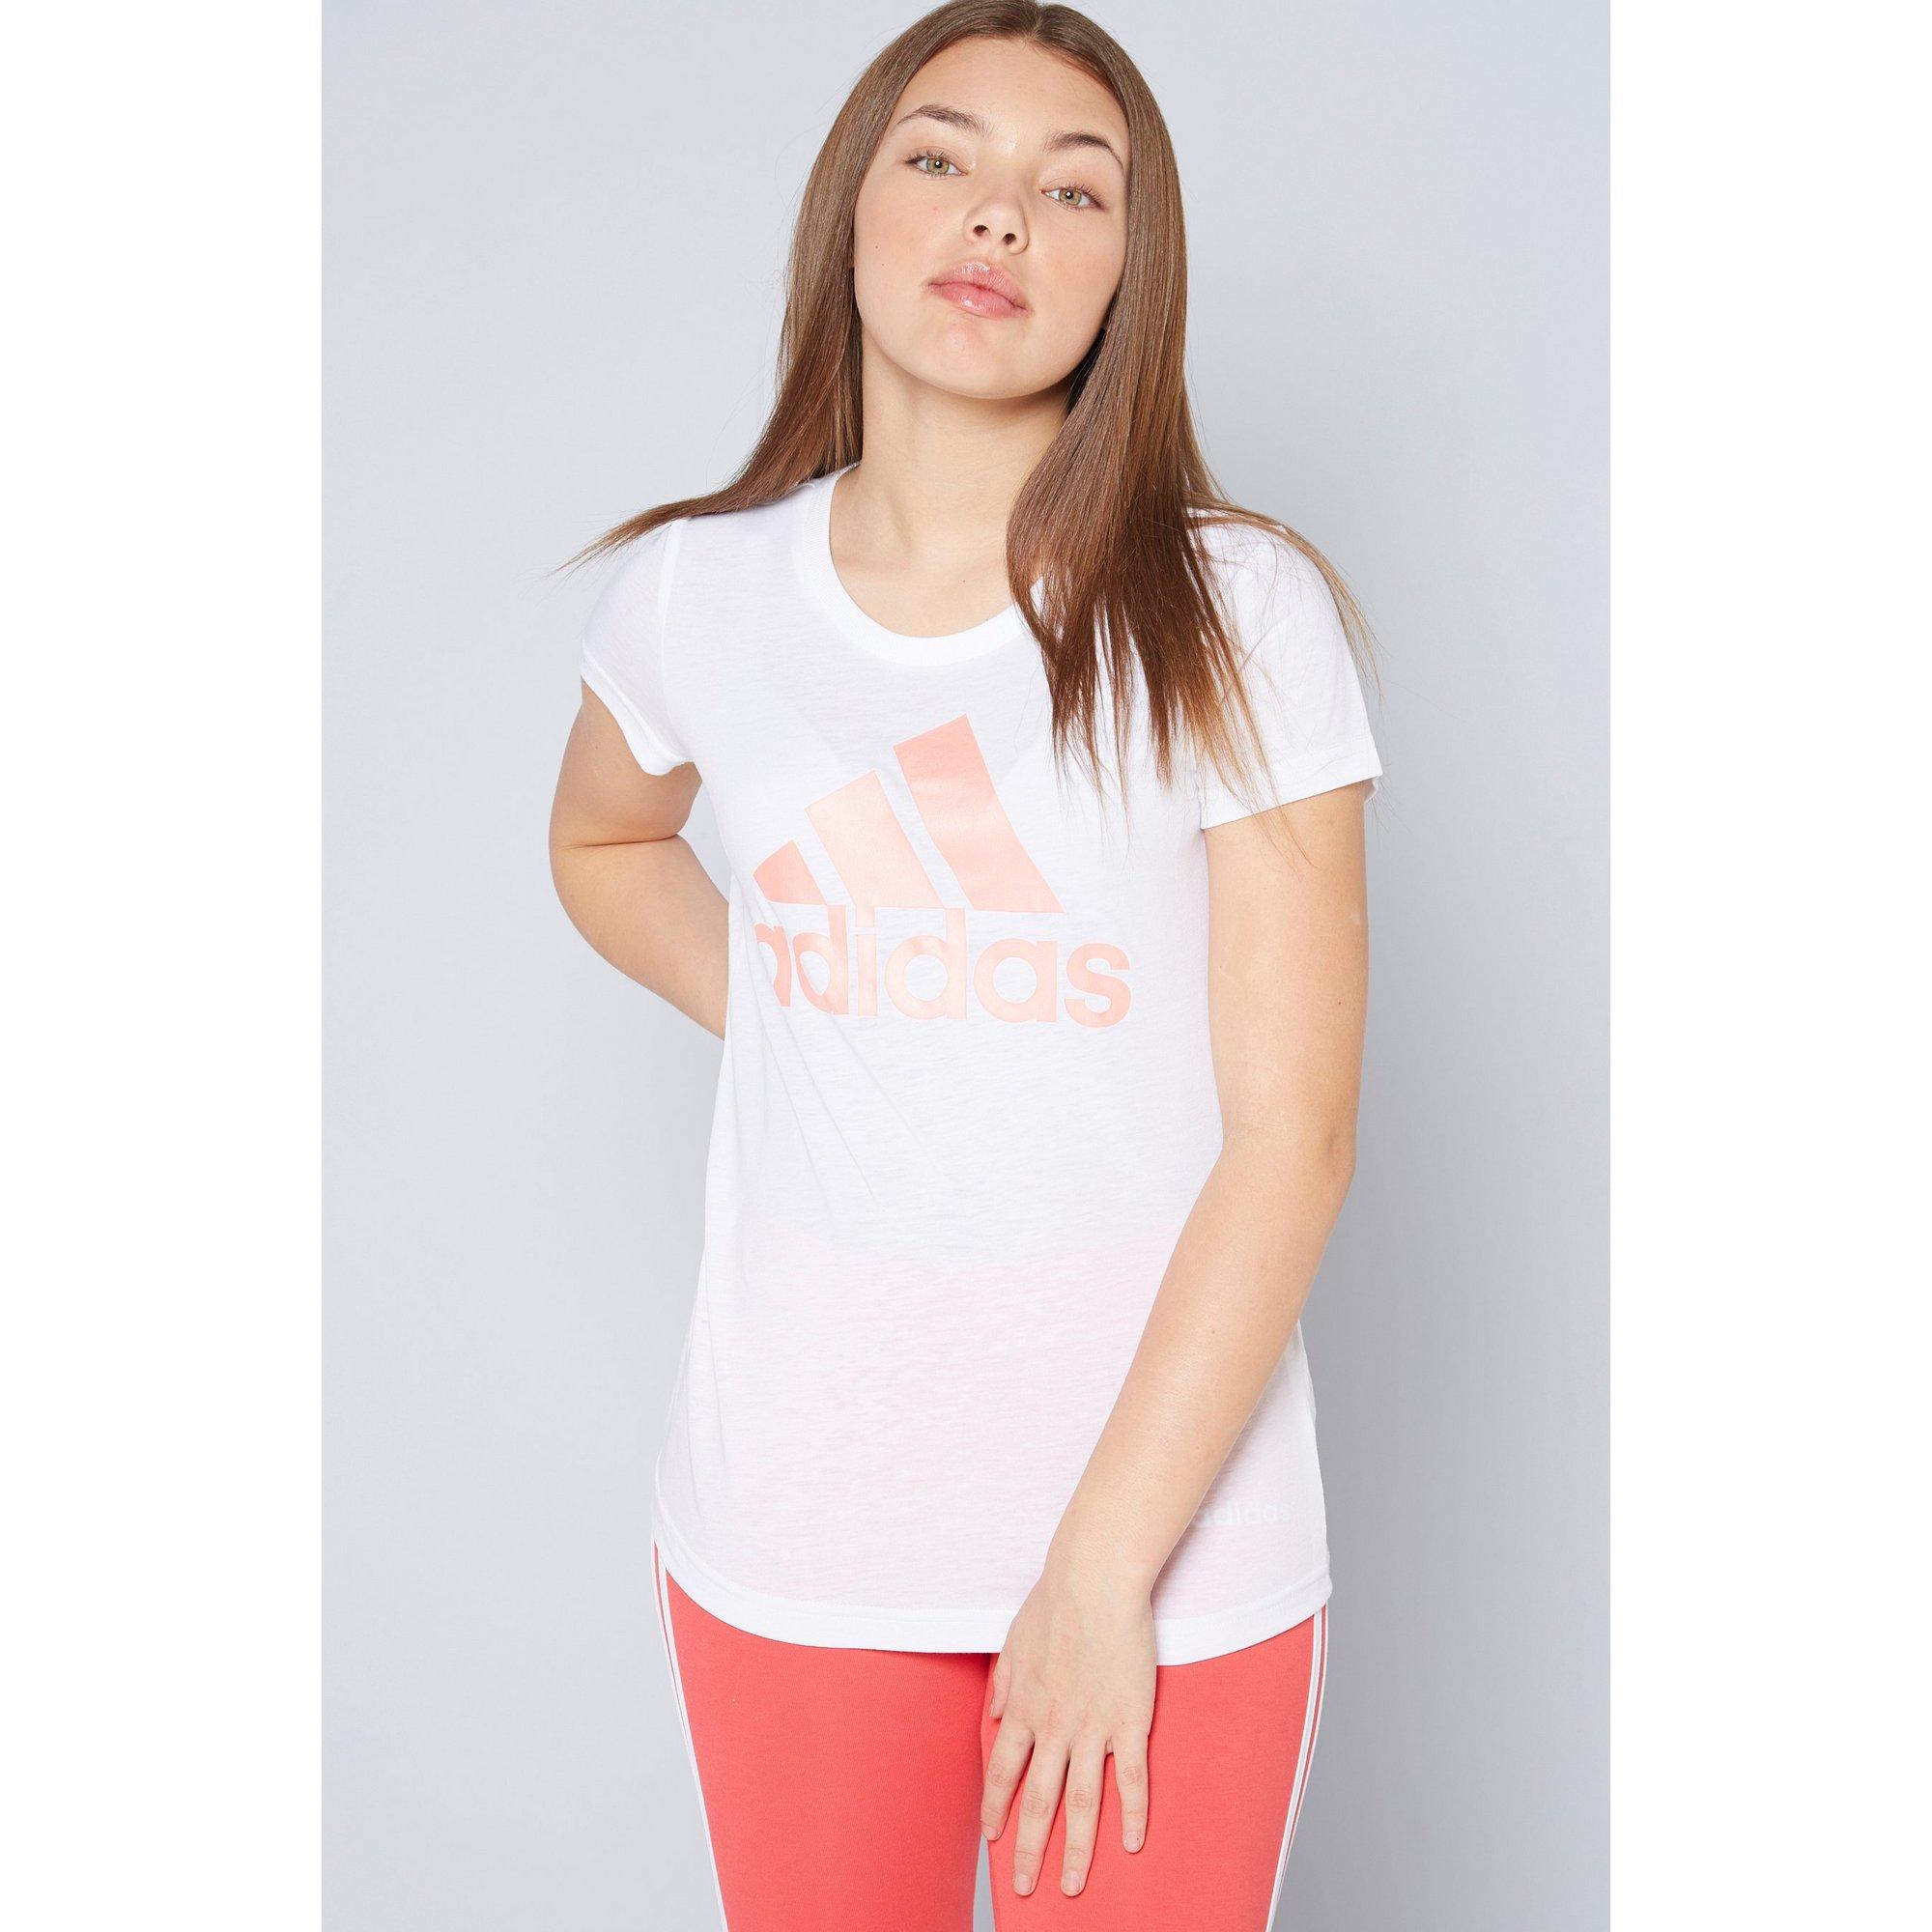 Image of Girls adidas BOS White/Haze Coral T-Shirt